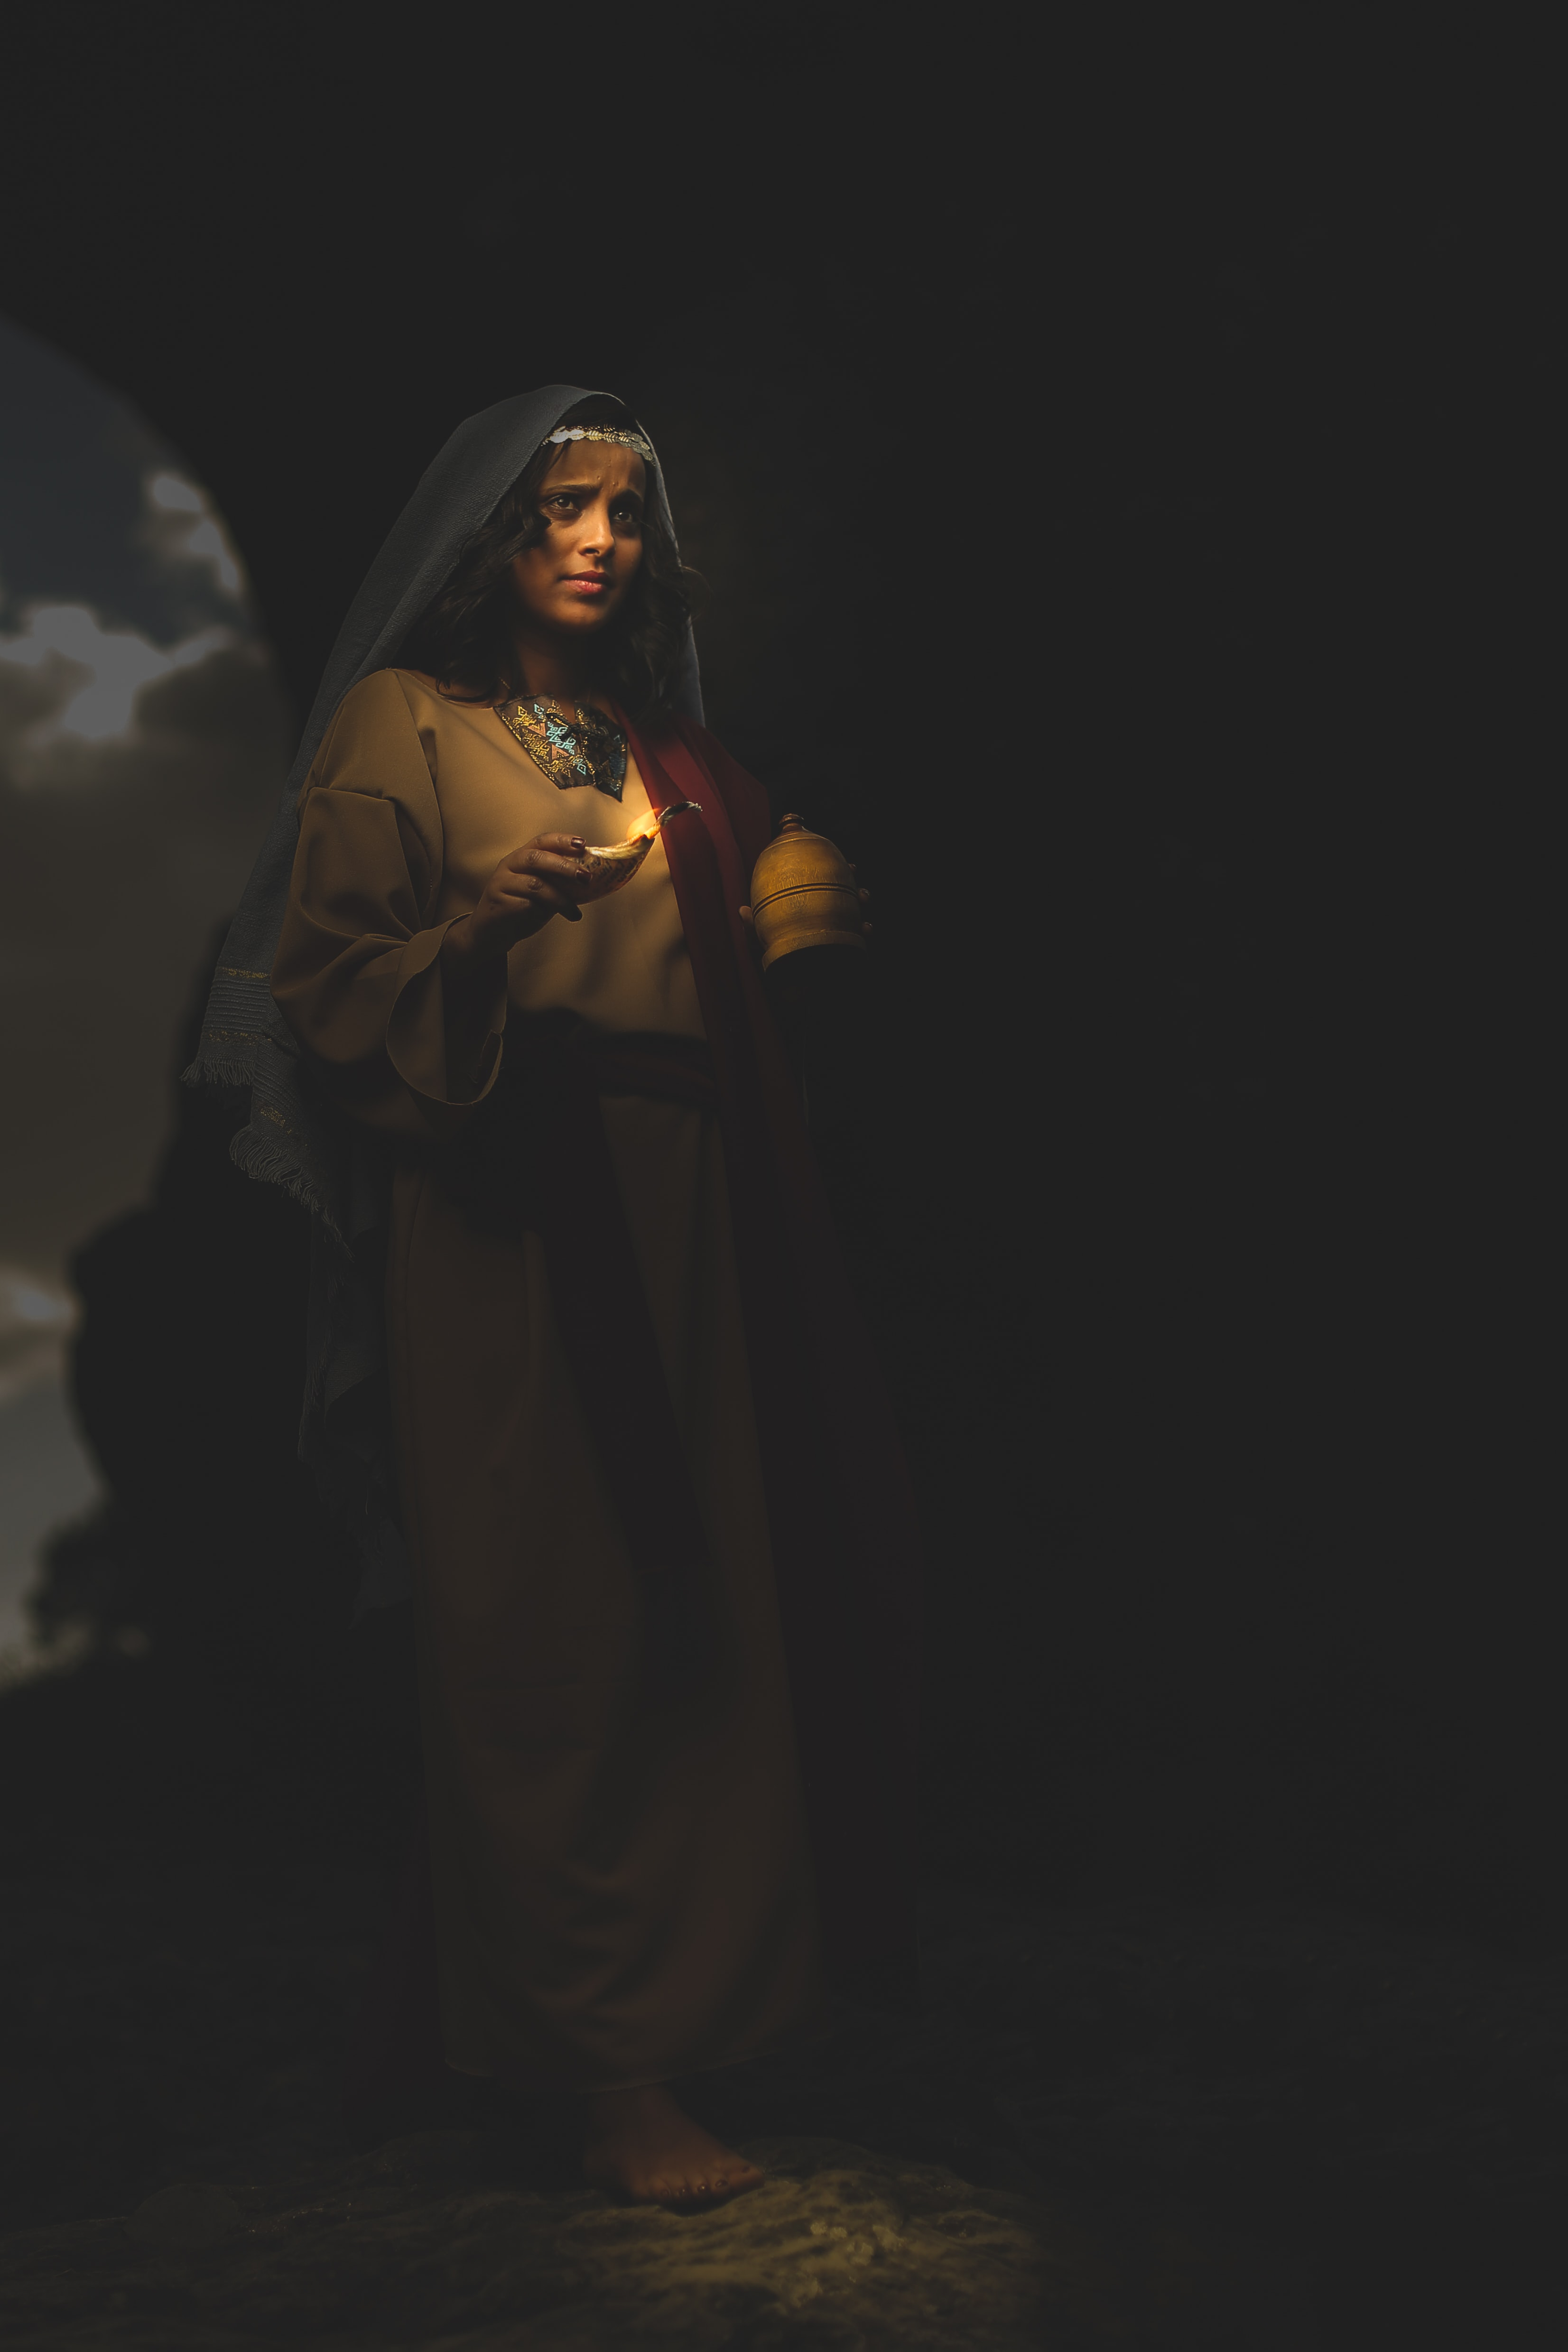 photo of woman